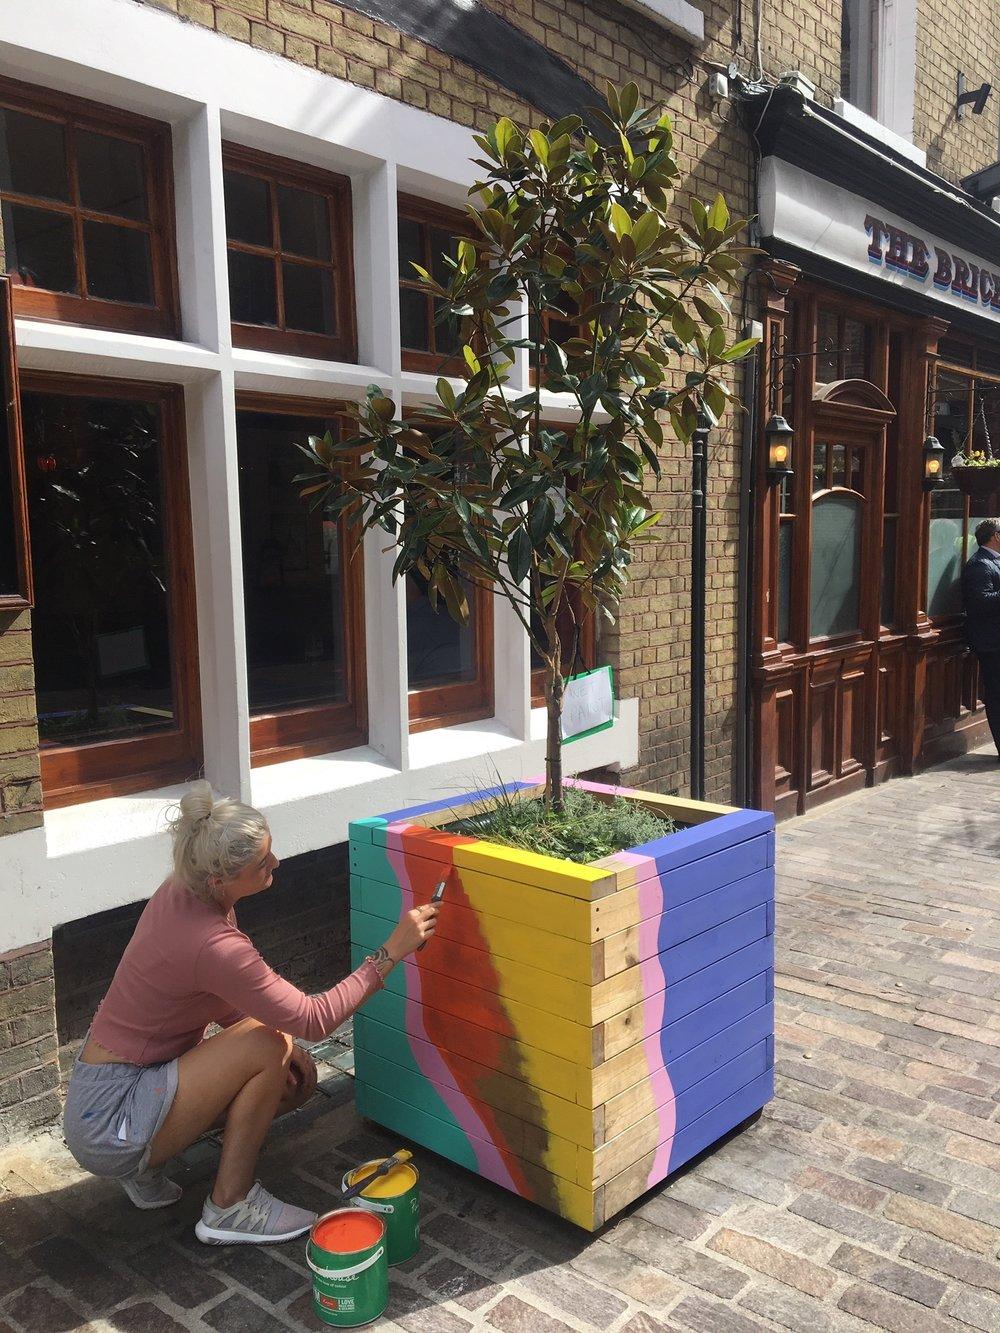 Lois O'Hara Painting Rivington Street Planters